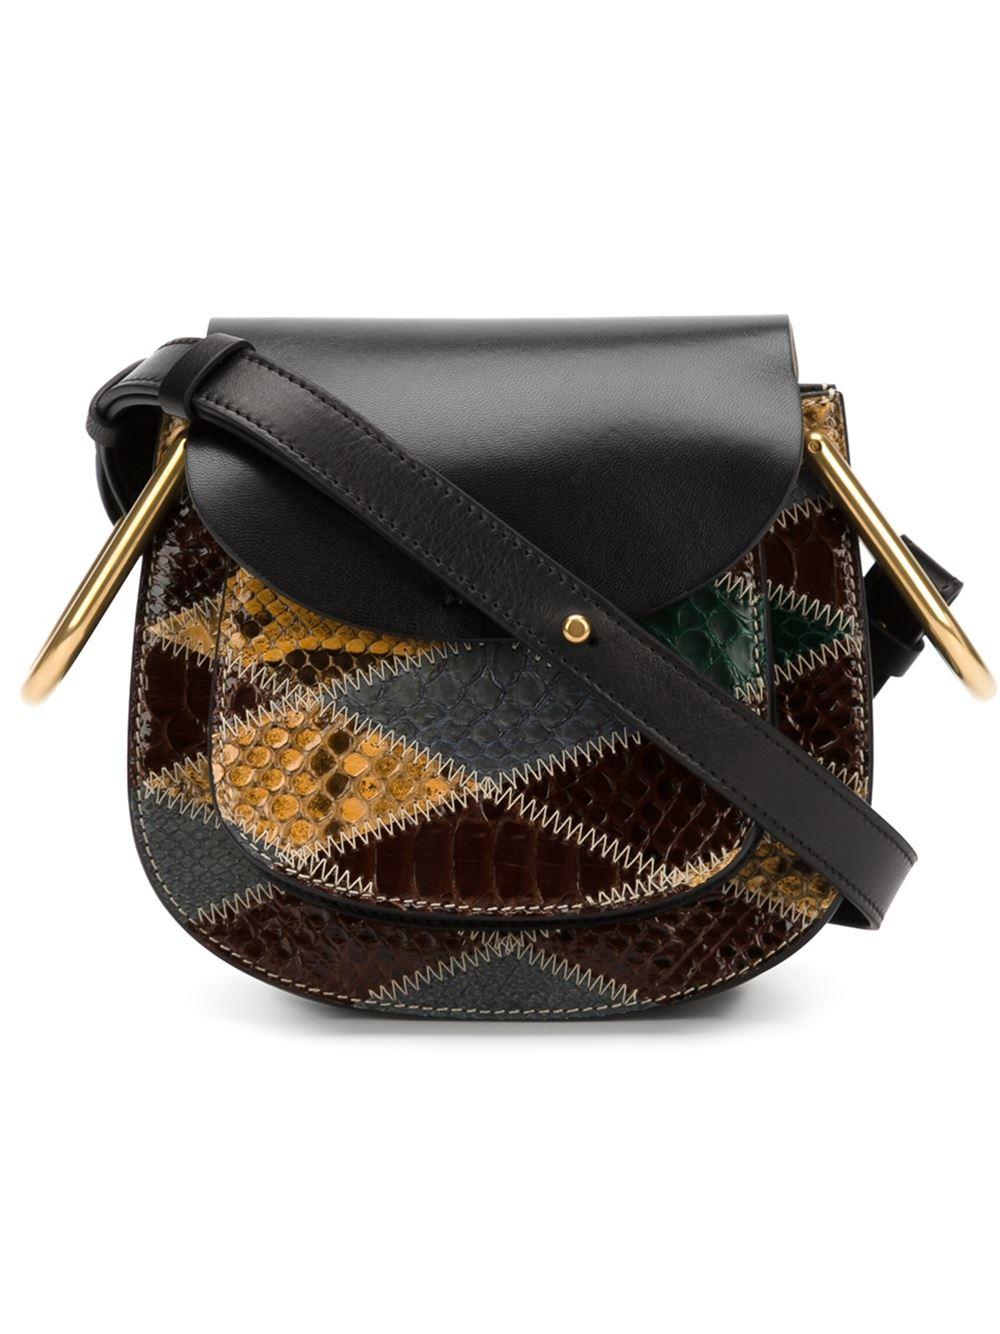 chloe handbags shop online - Chlo�� Mini 'hudson' Shoulder Bag in Black | Lyst